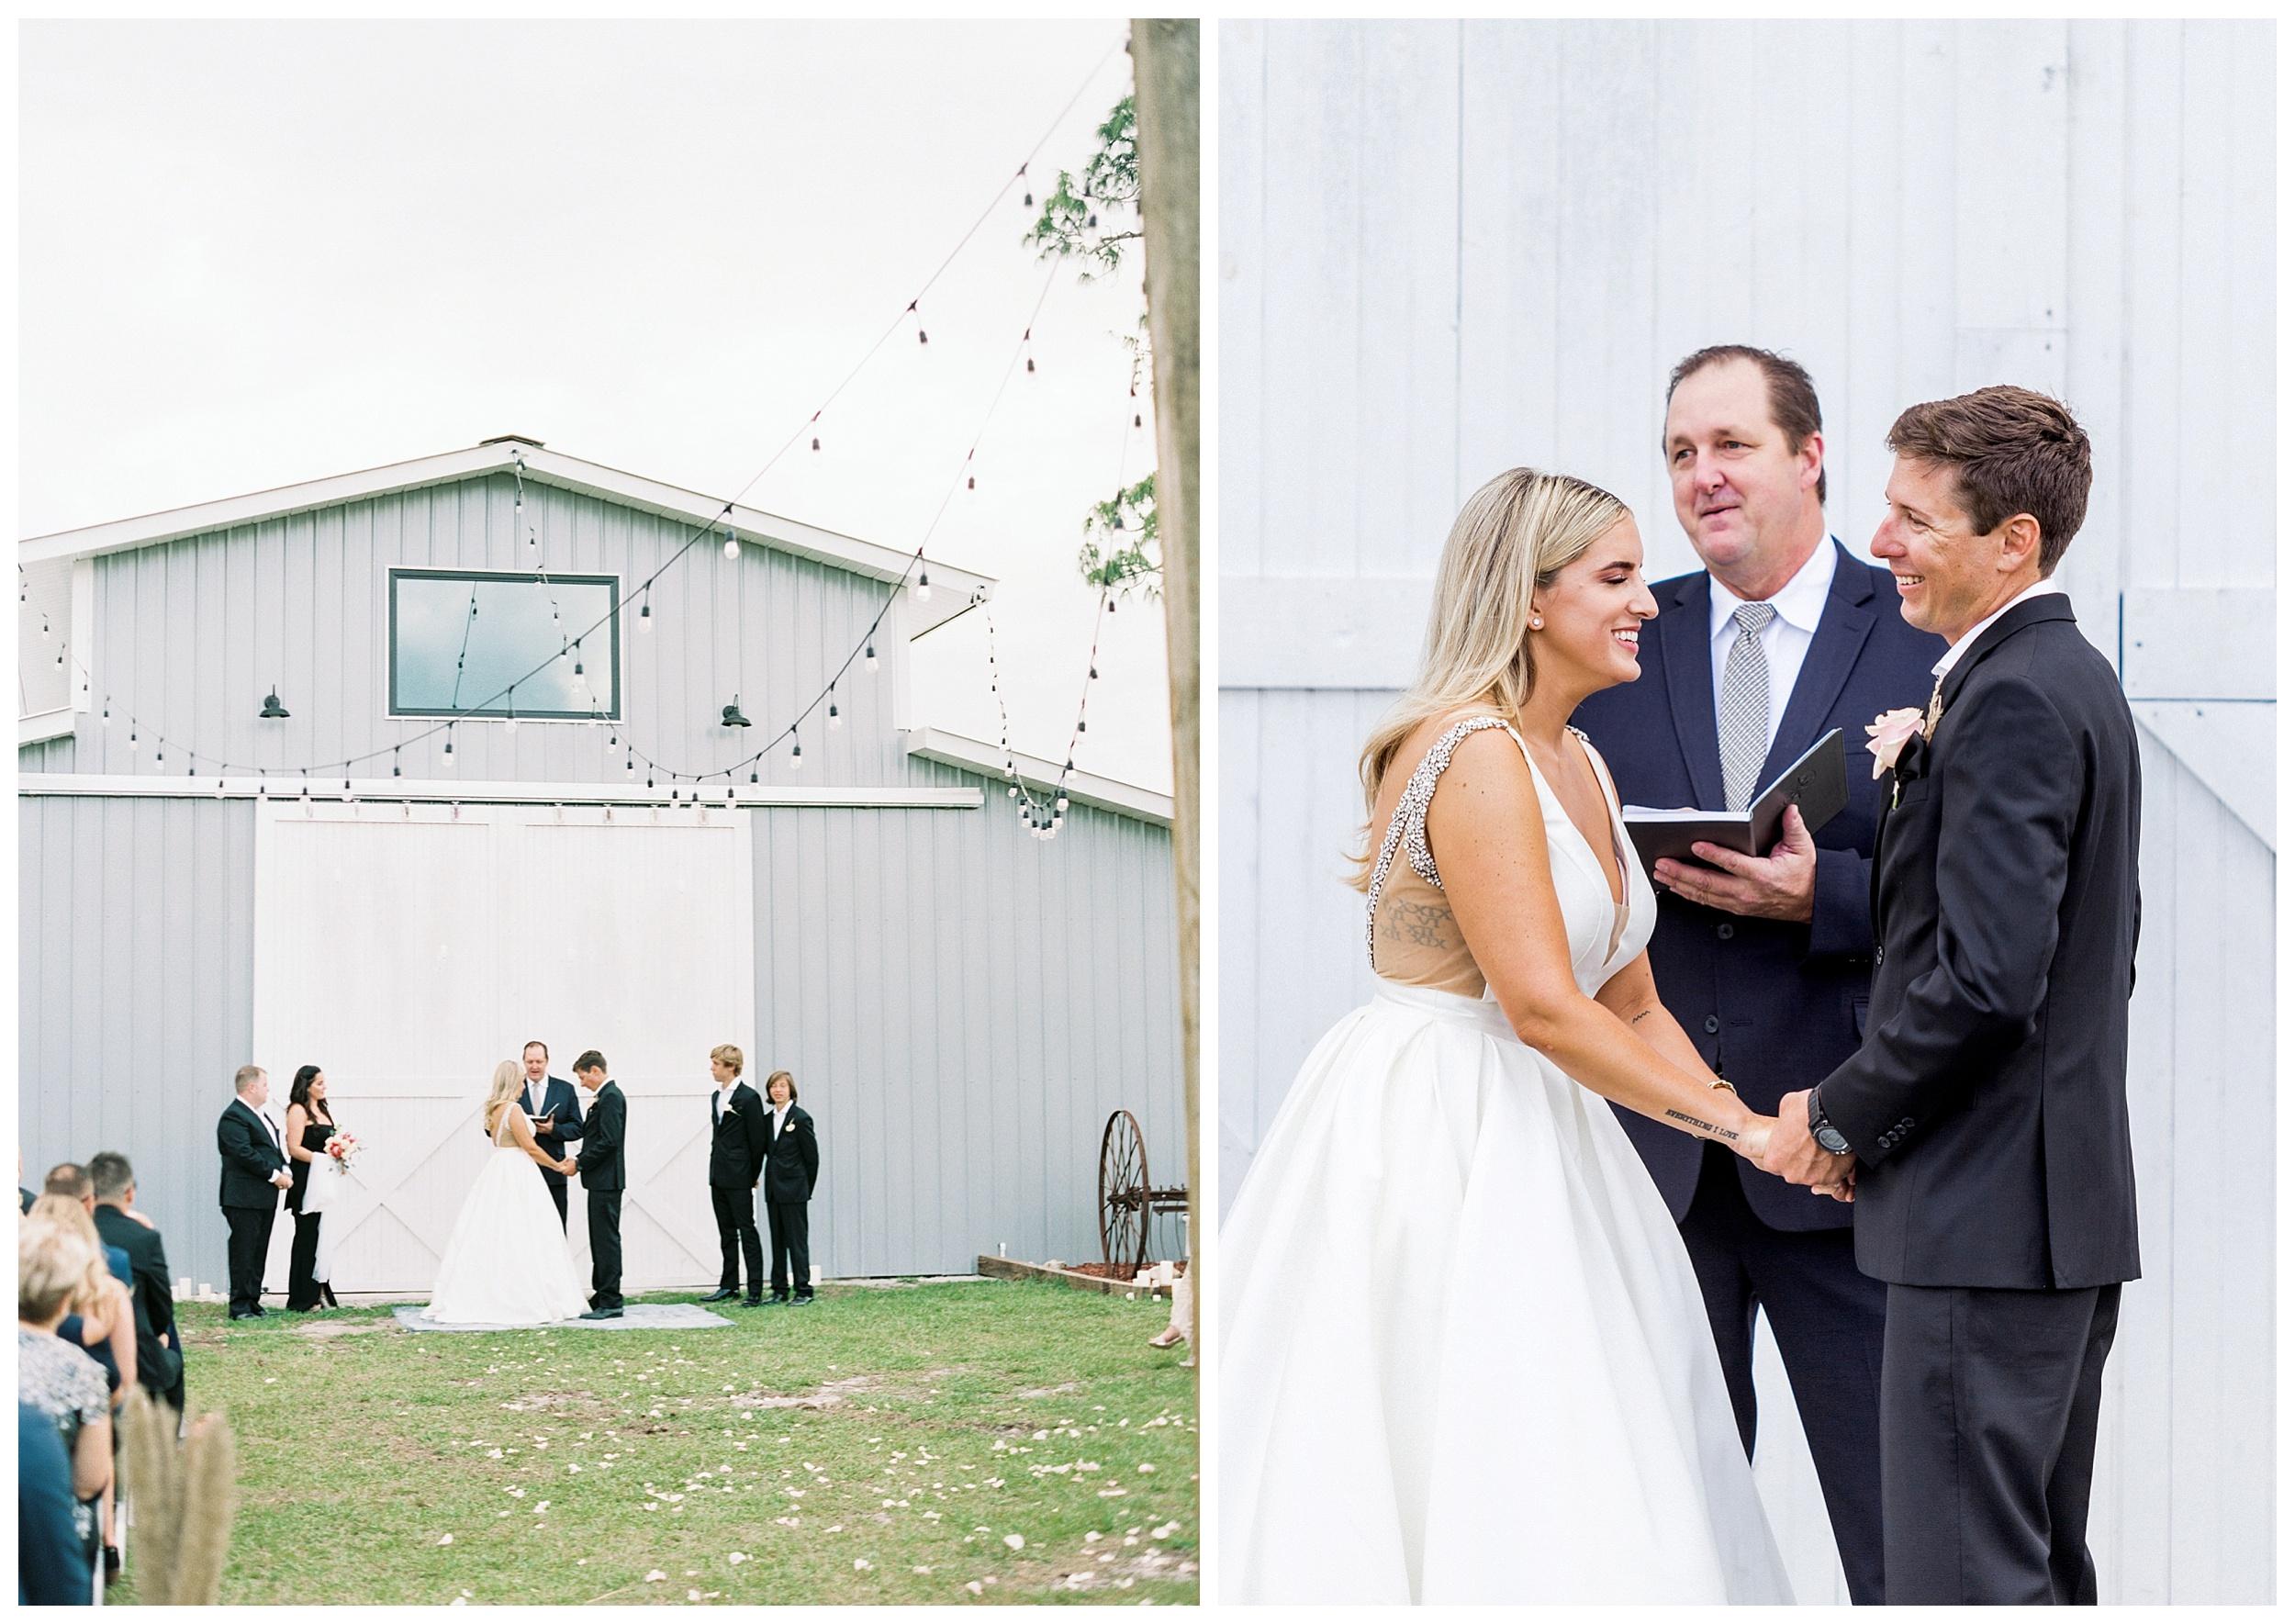 South Florida Wedding Photographer Kir Tuben_0076.jpg